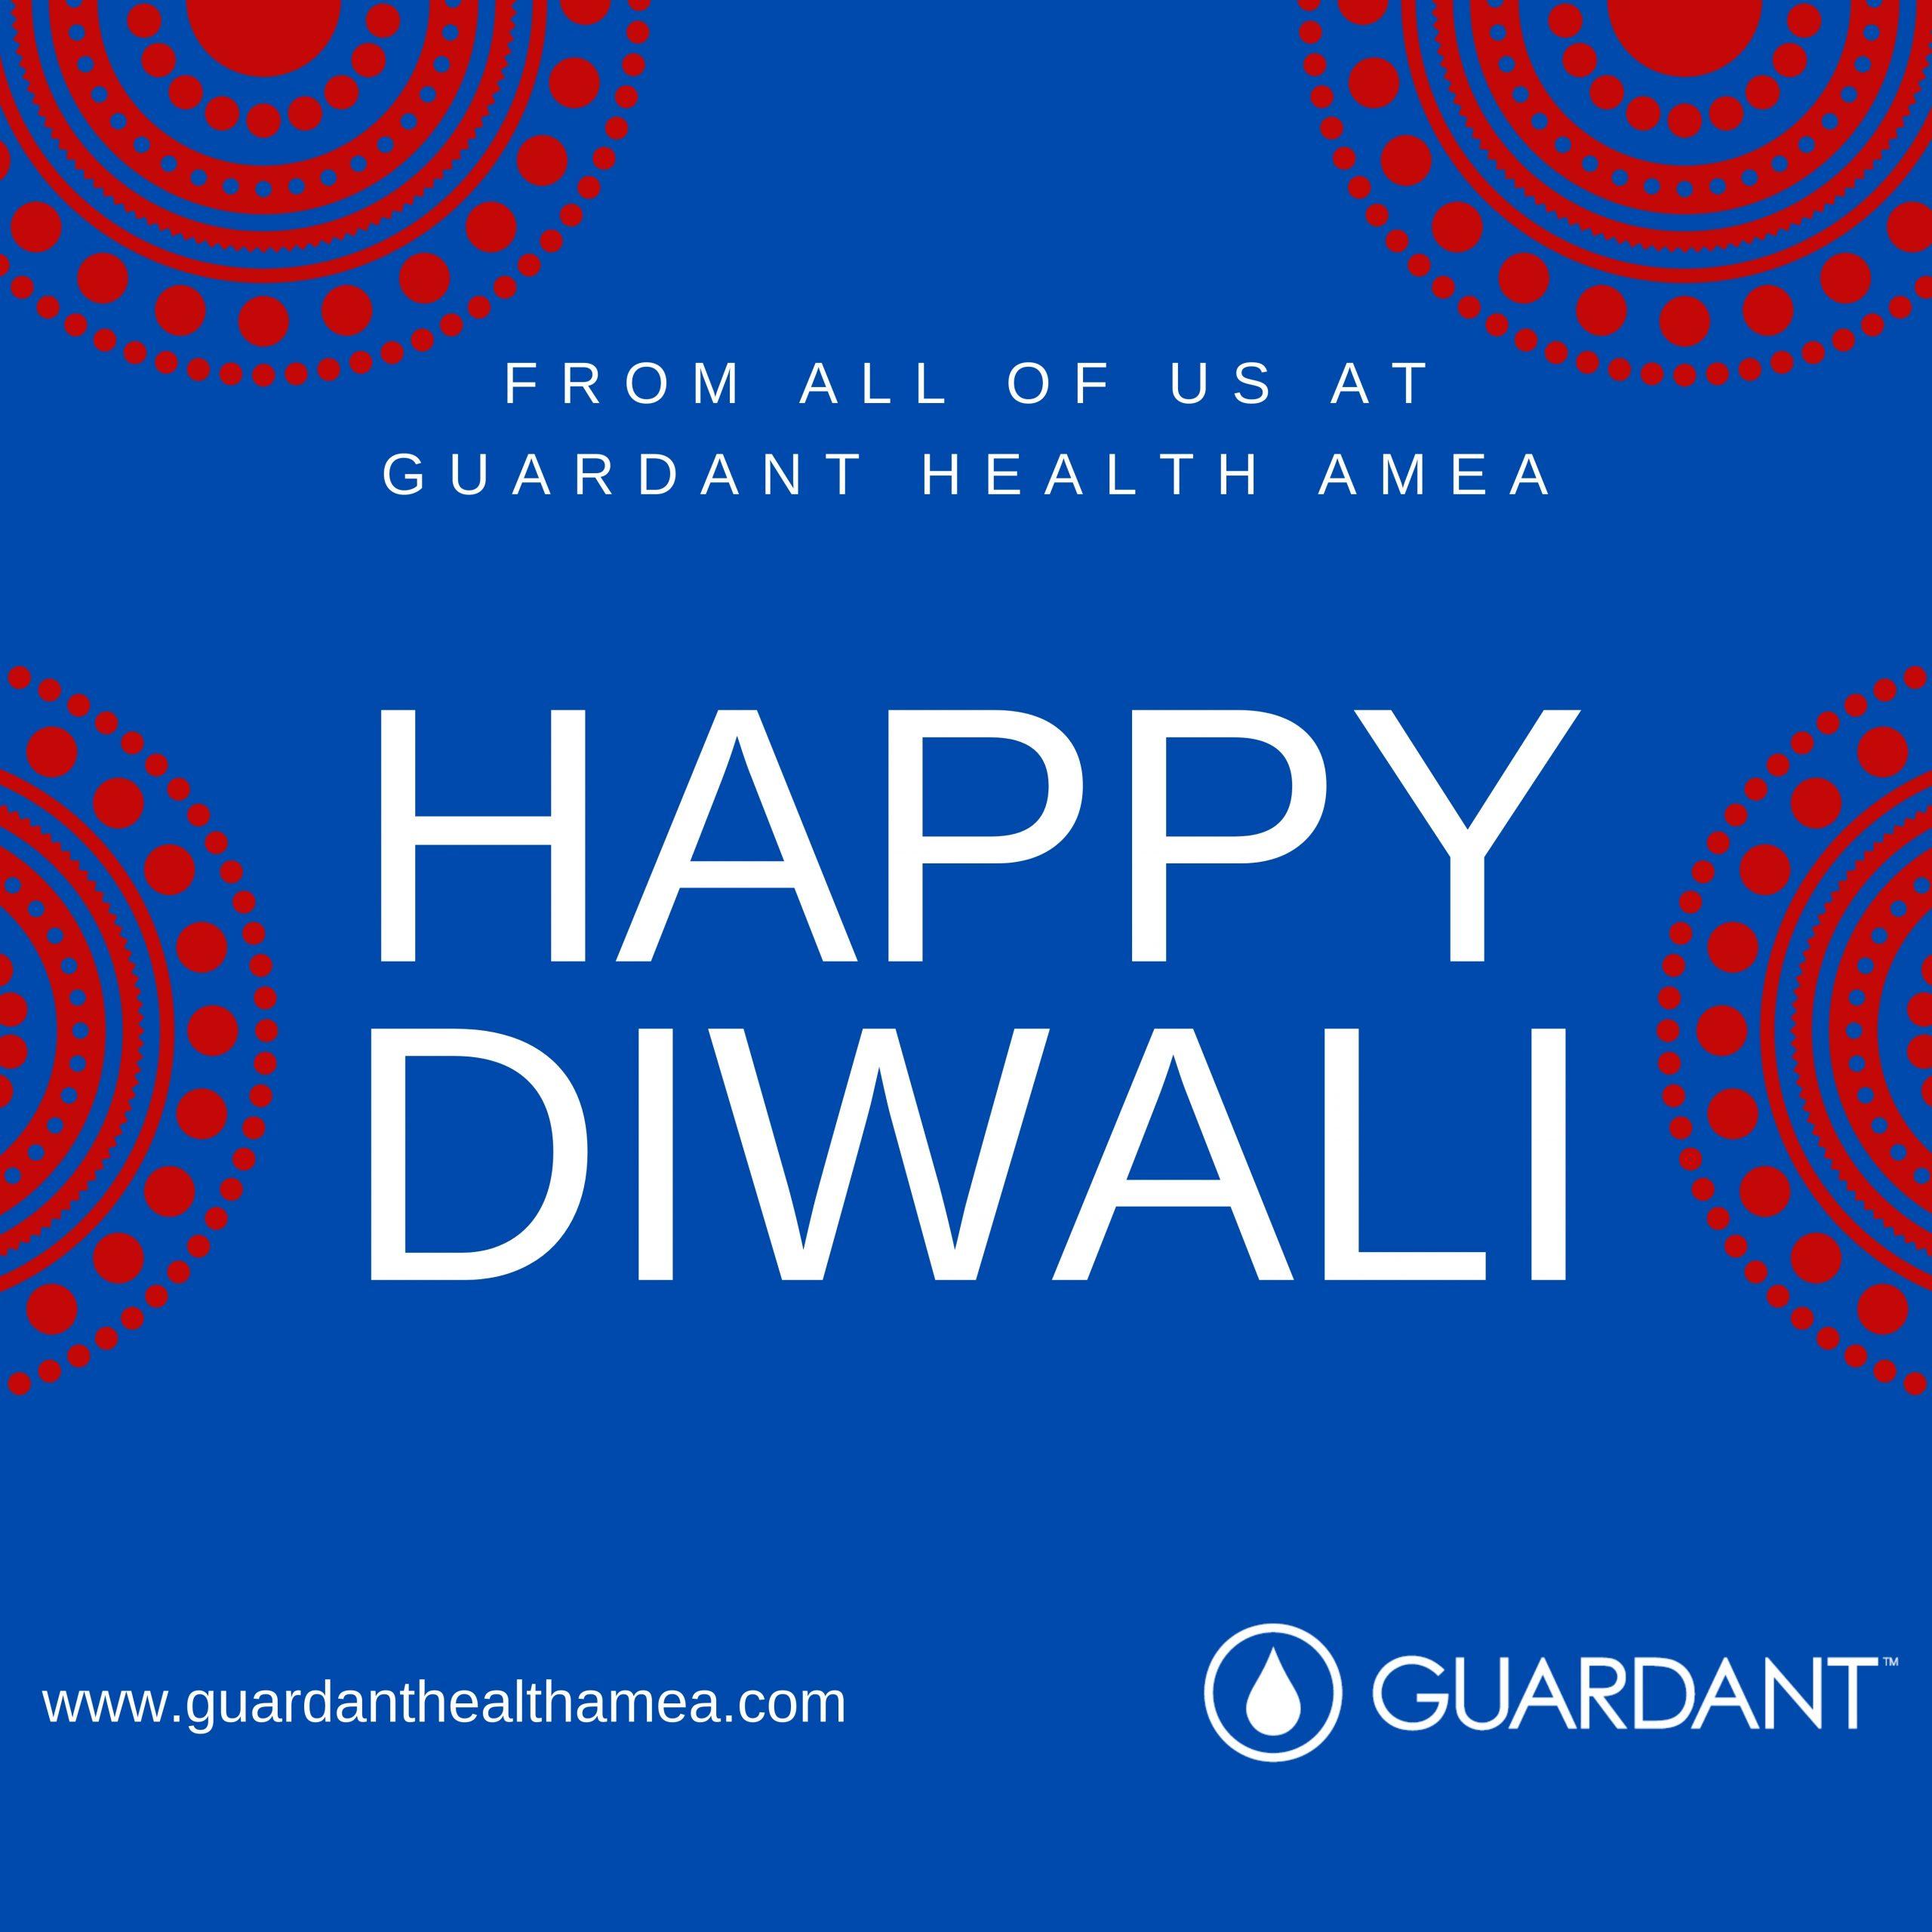 Happy Diwali! – from all of us atguardanthealthamea.com